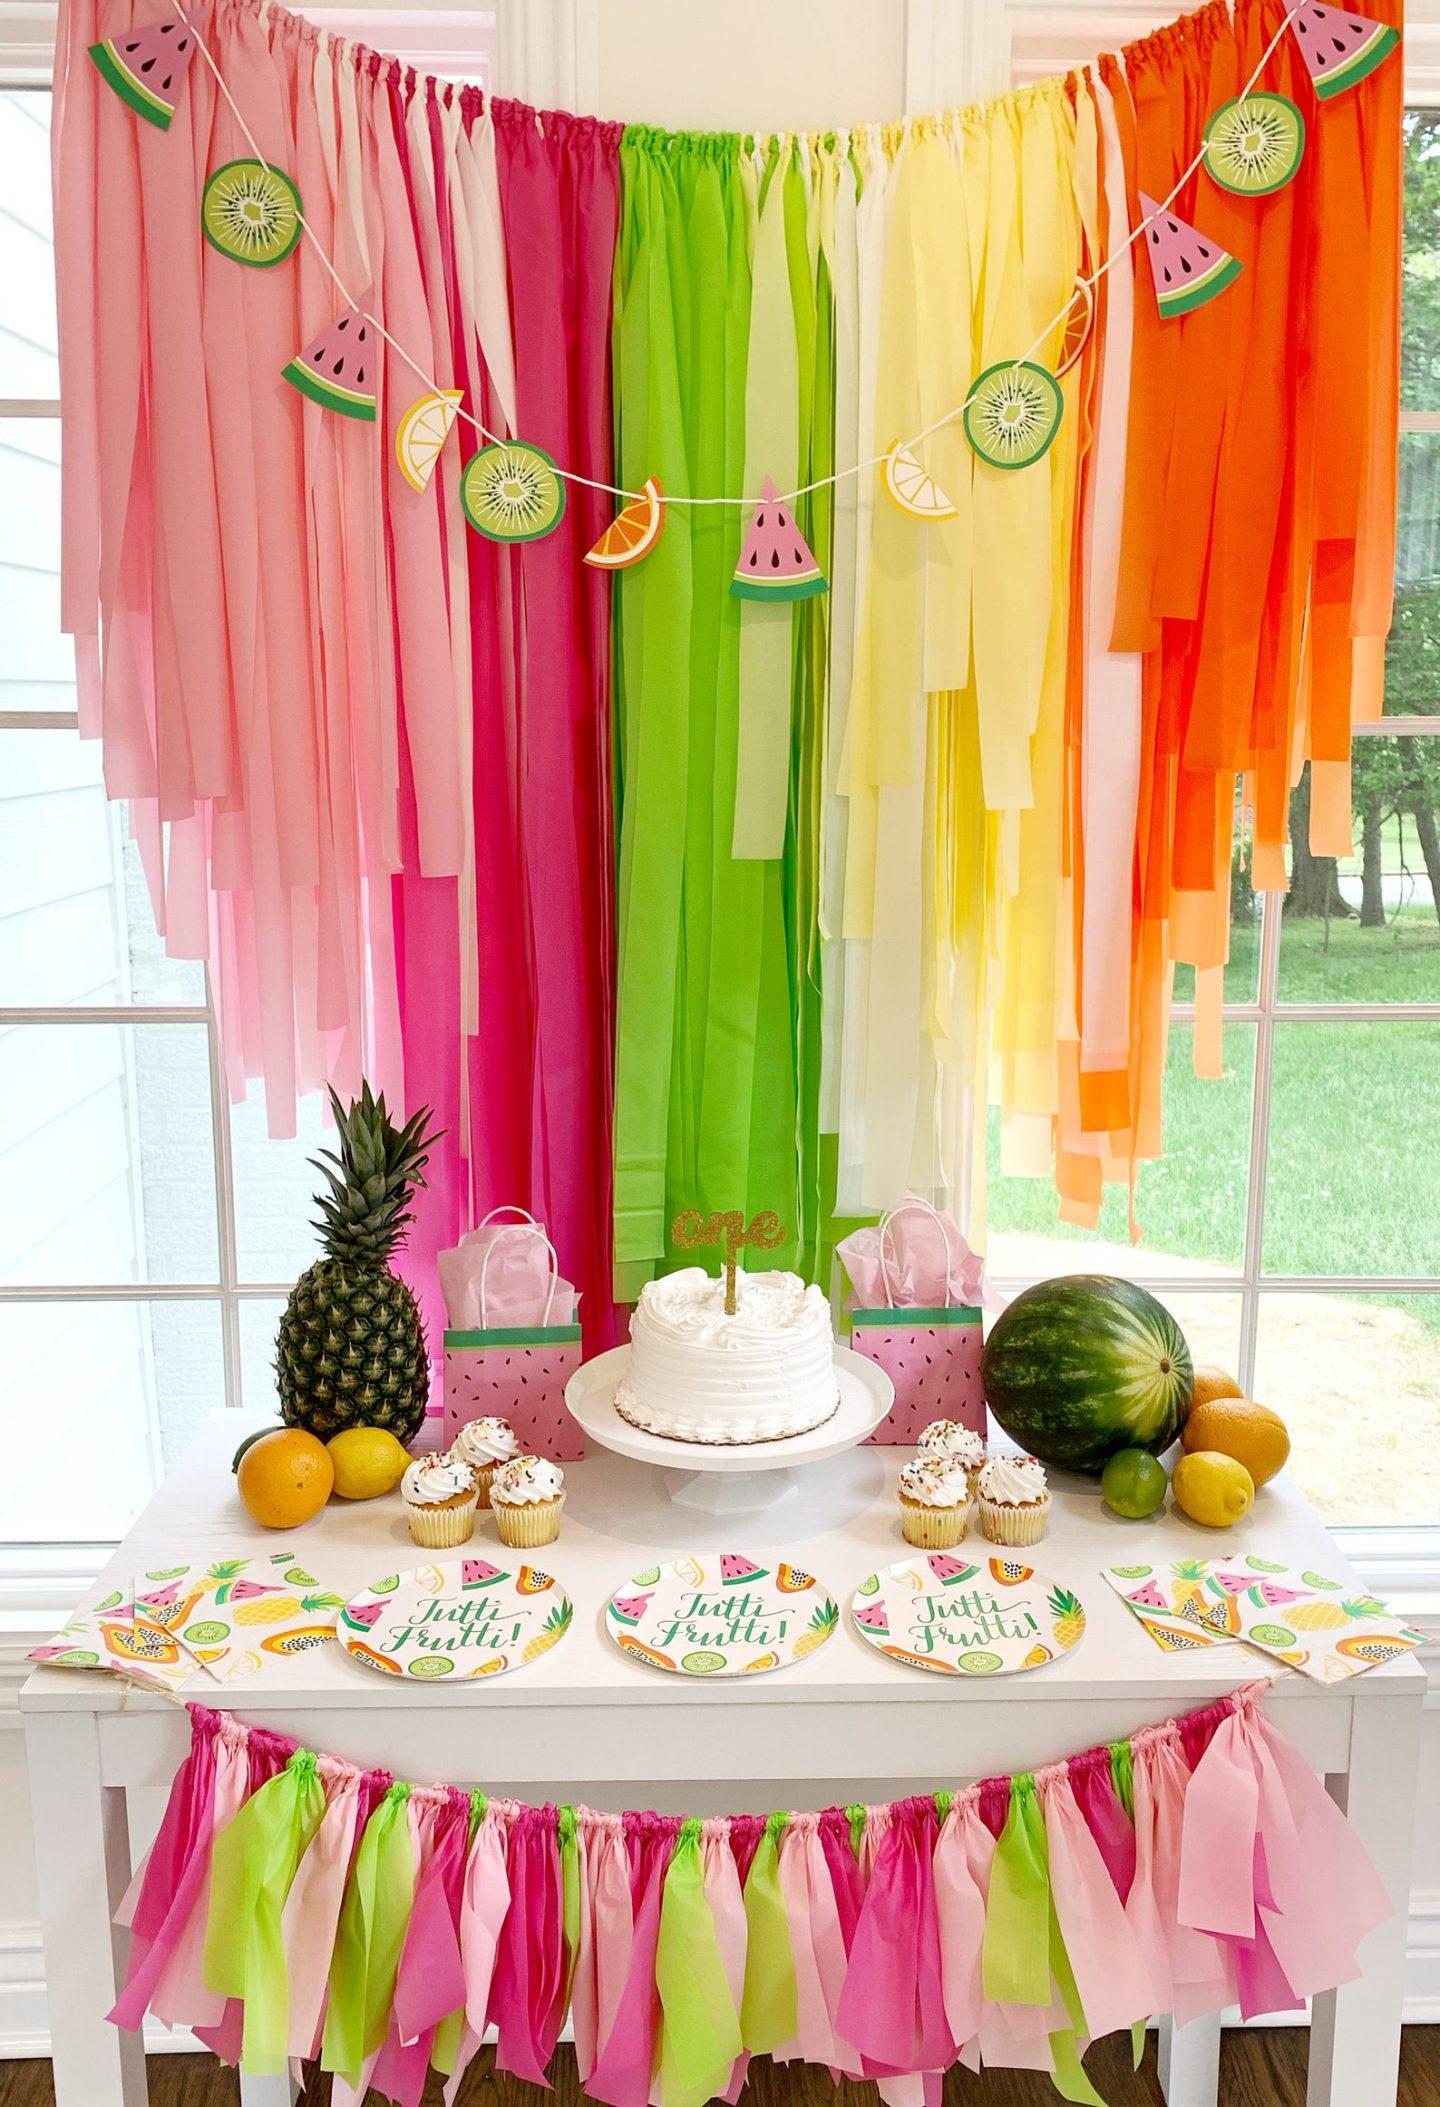 Rainbow and watermelon fringe birthday decor